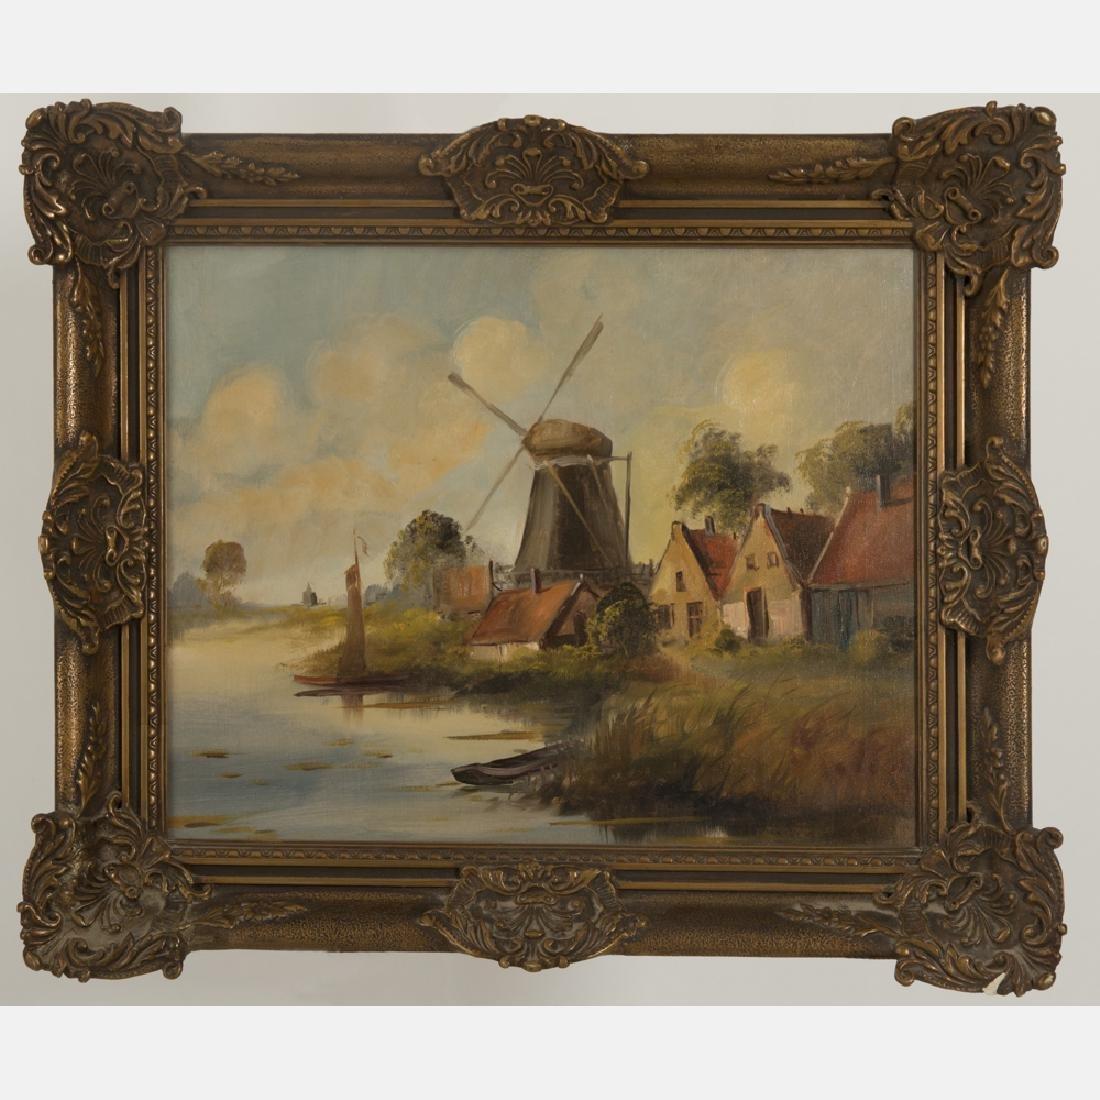 Artist Unknown (19th/20th Century) River Scene with